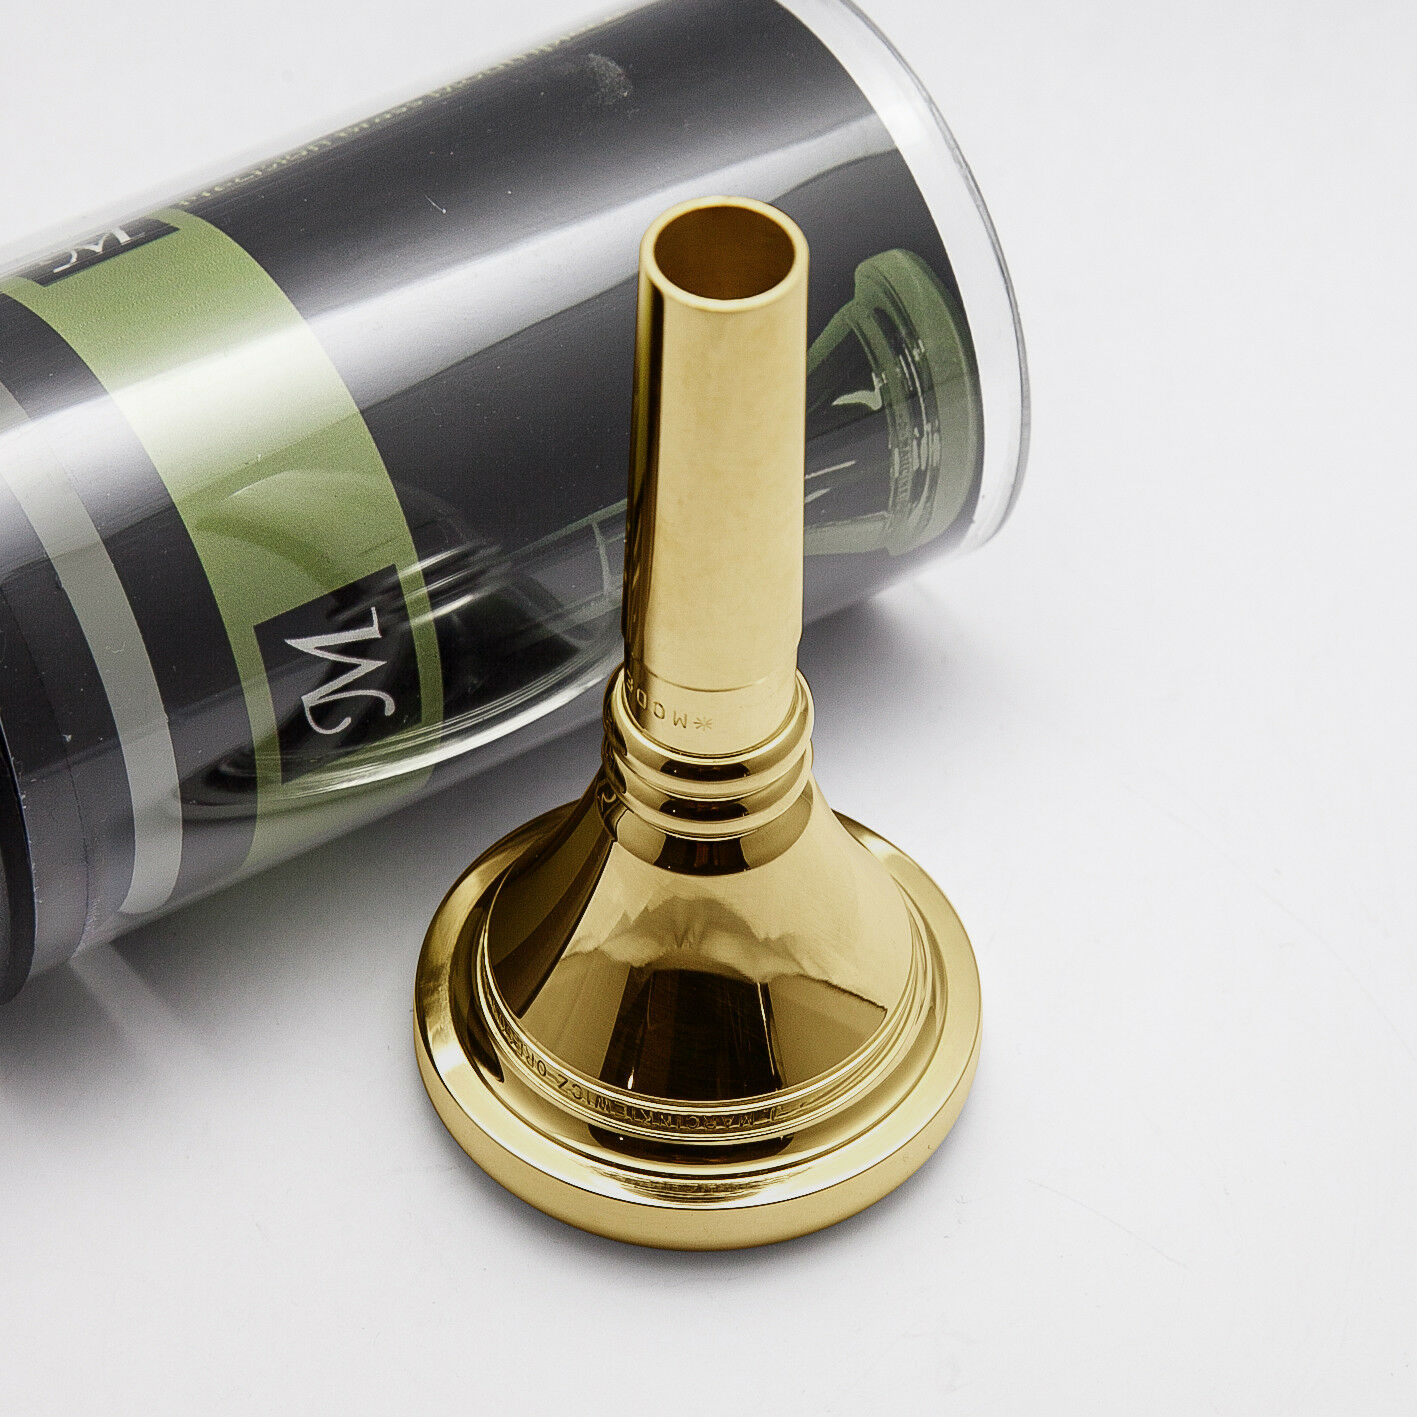 24K Gold Rim /& Cup Marcinkiewicz Tuba Mouthpiece N4